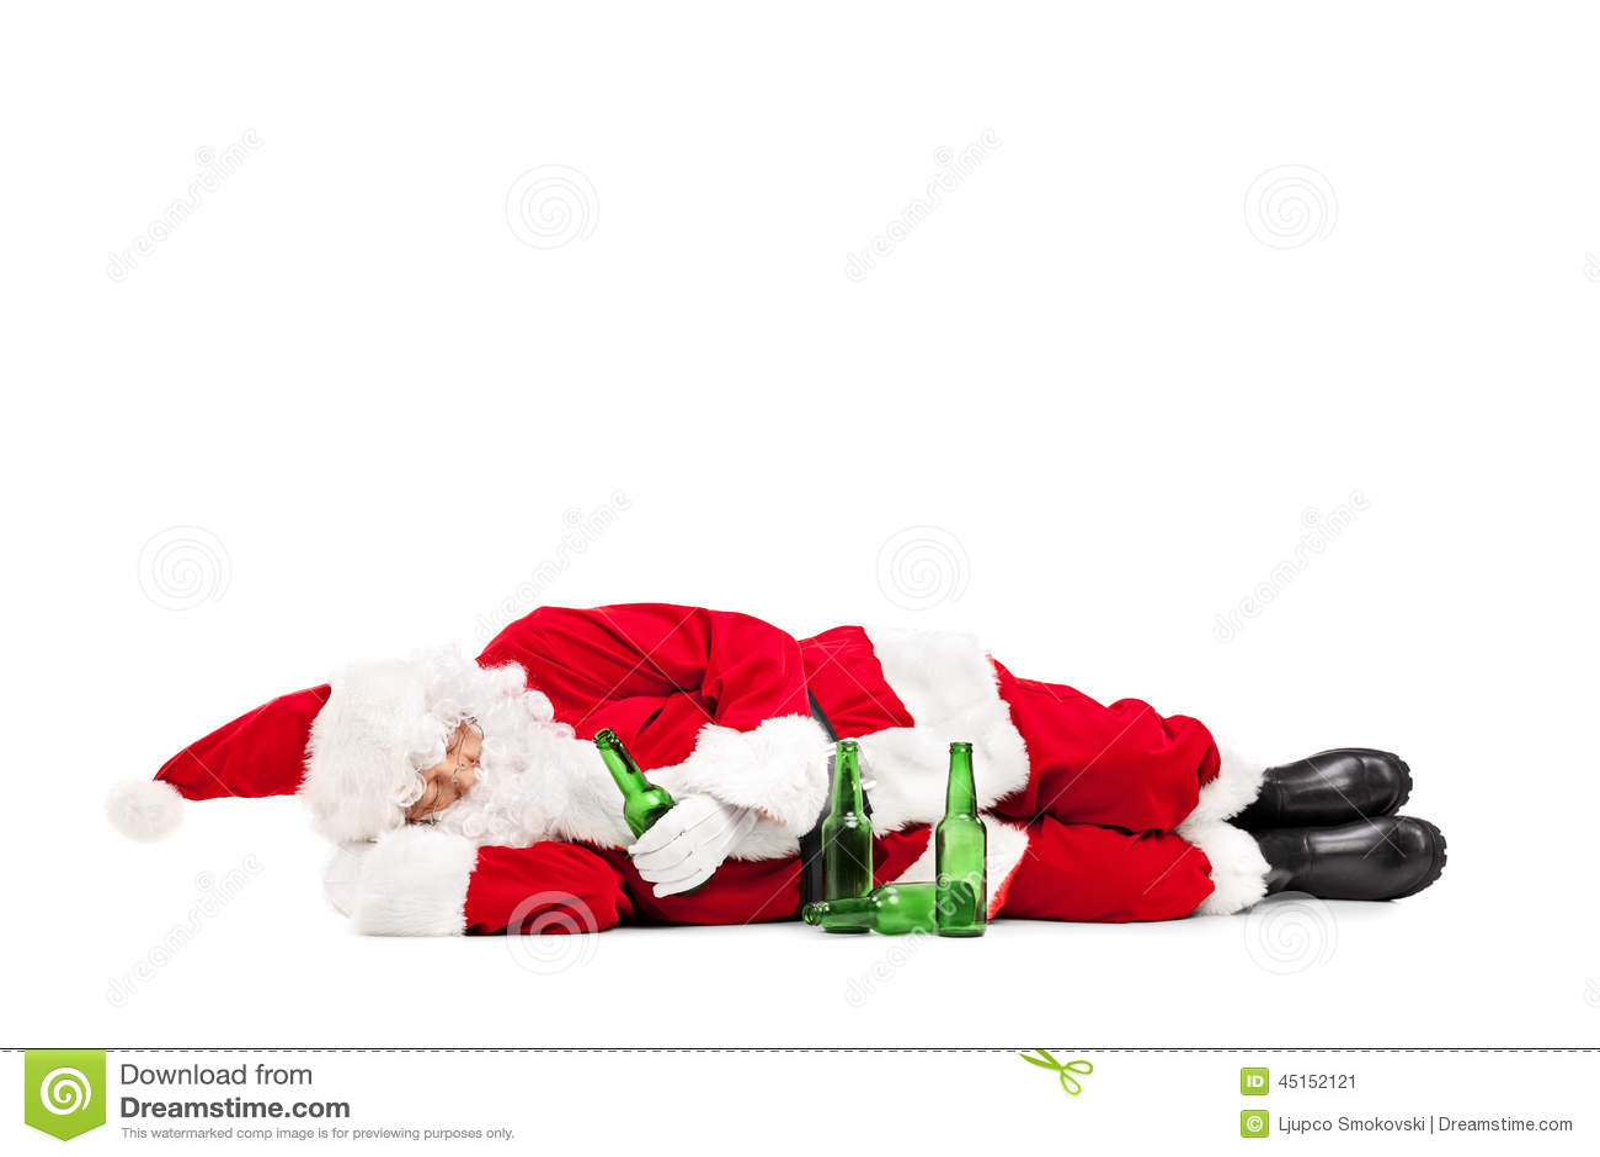 Drunk Santa Claus Stock Photos, Images, & Pictures - 834 Images